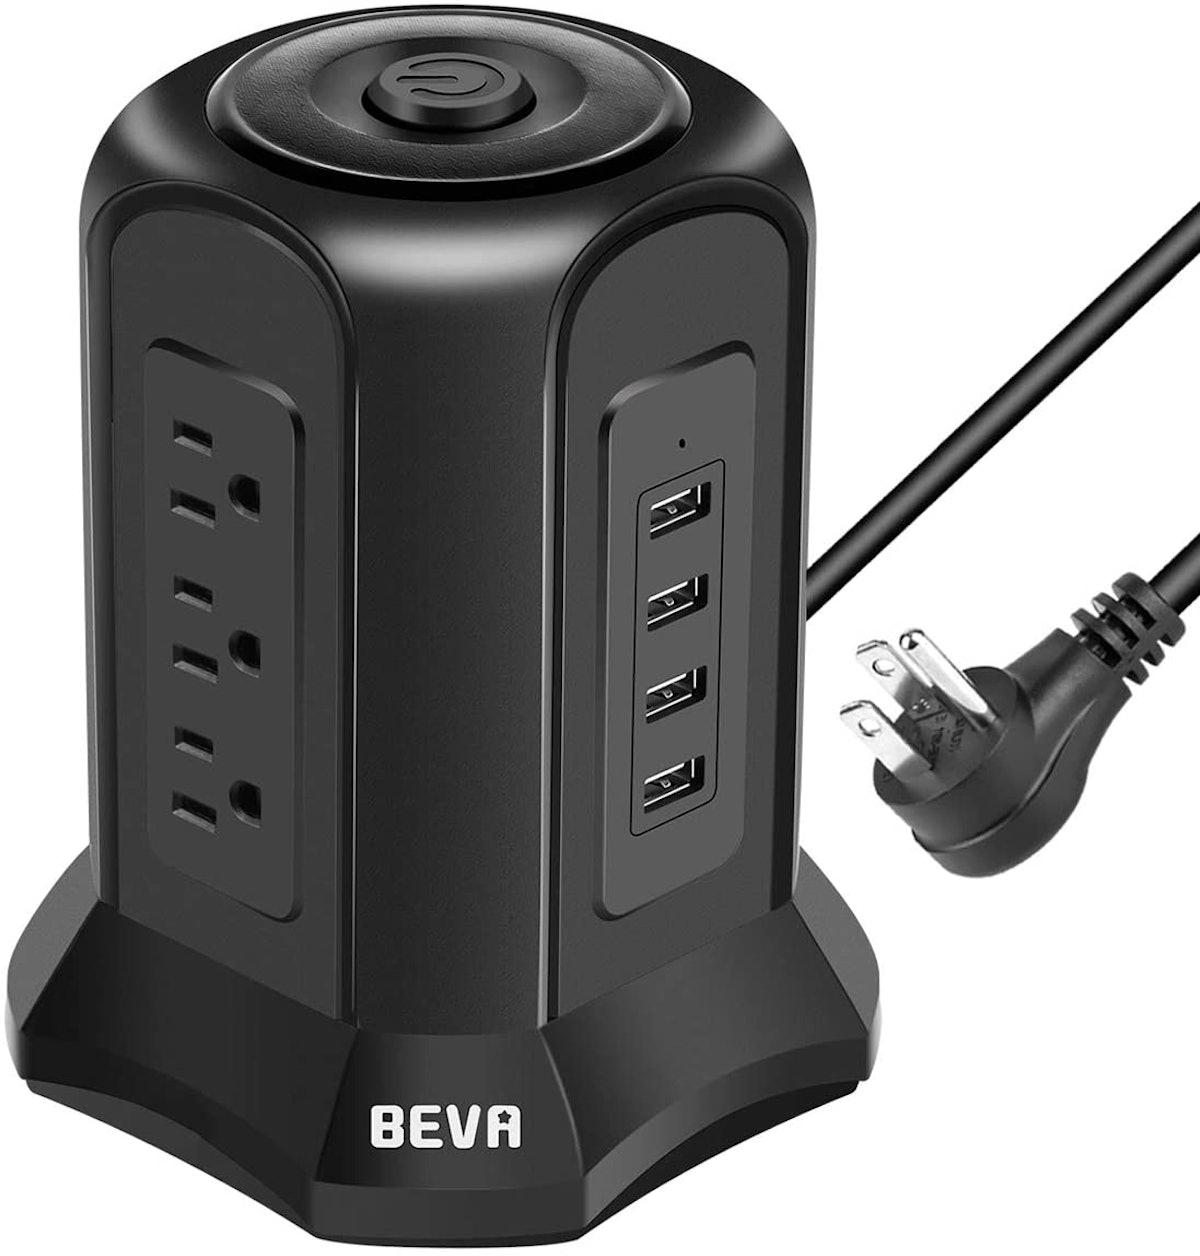 BEVA Power Strip Tower